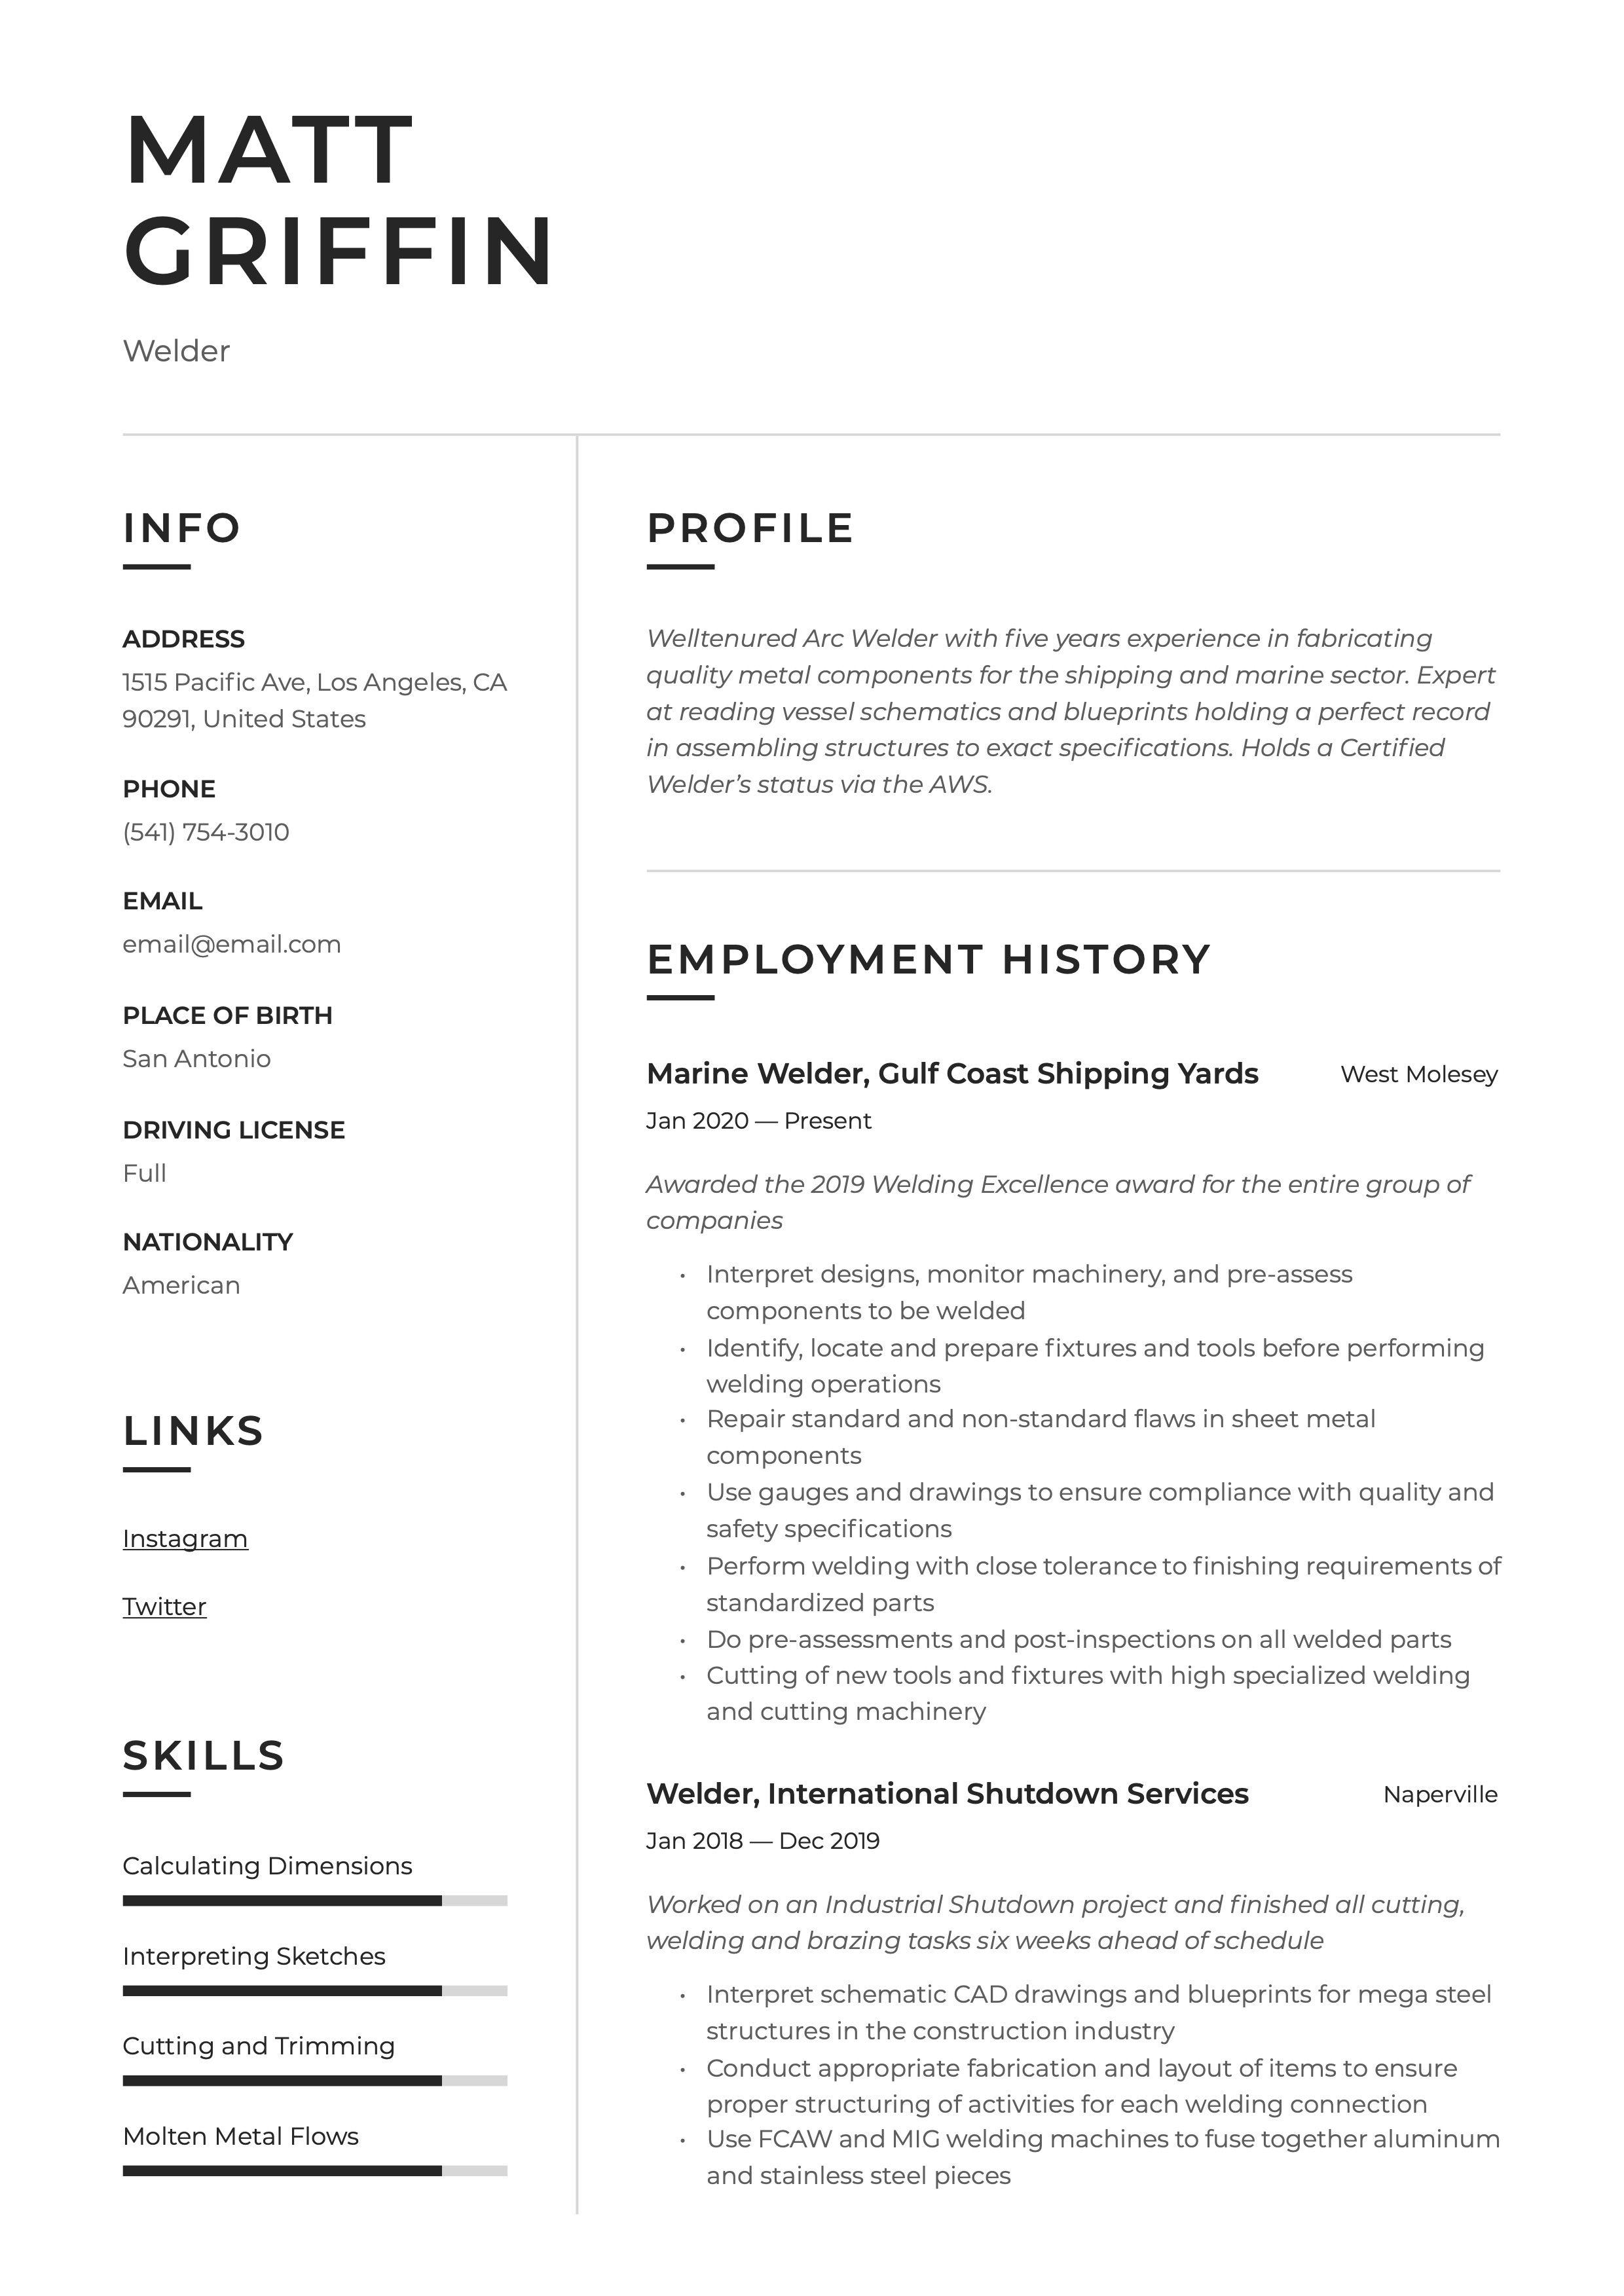 Welder Resume Template Resume Examples Professional Resume Examples Resume Guide